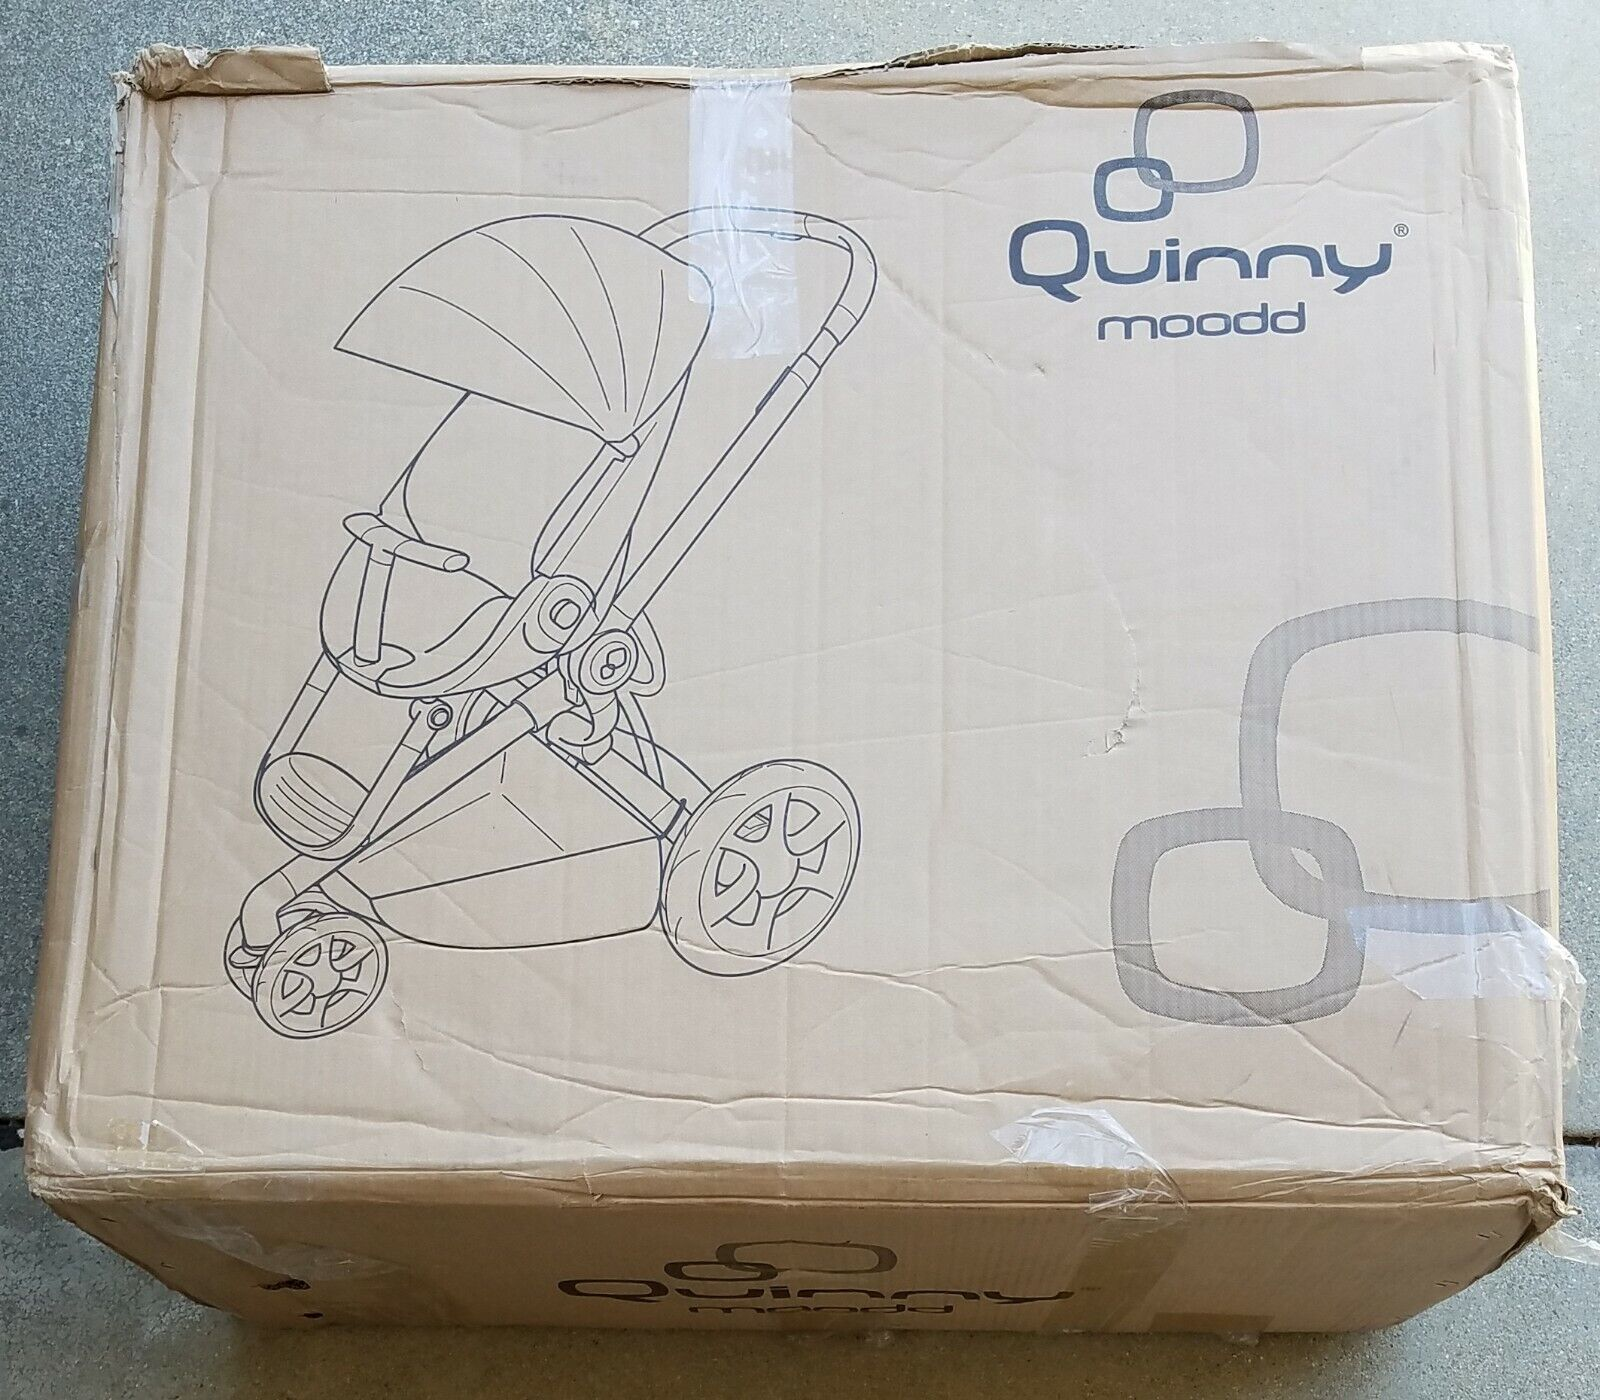 Quinny Moodd Pushchair Black Irony Standard Single Seat Stro